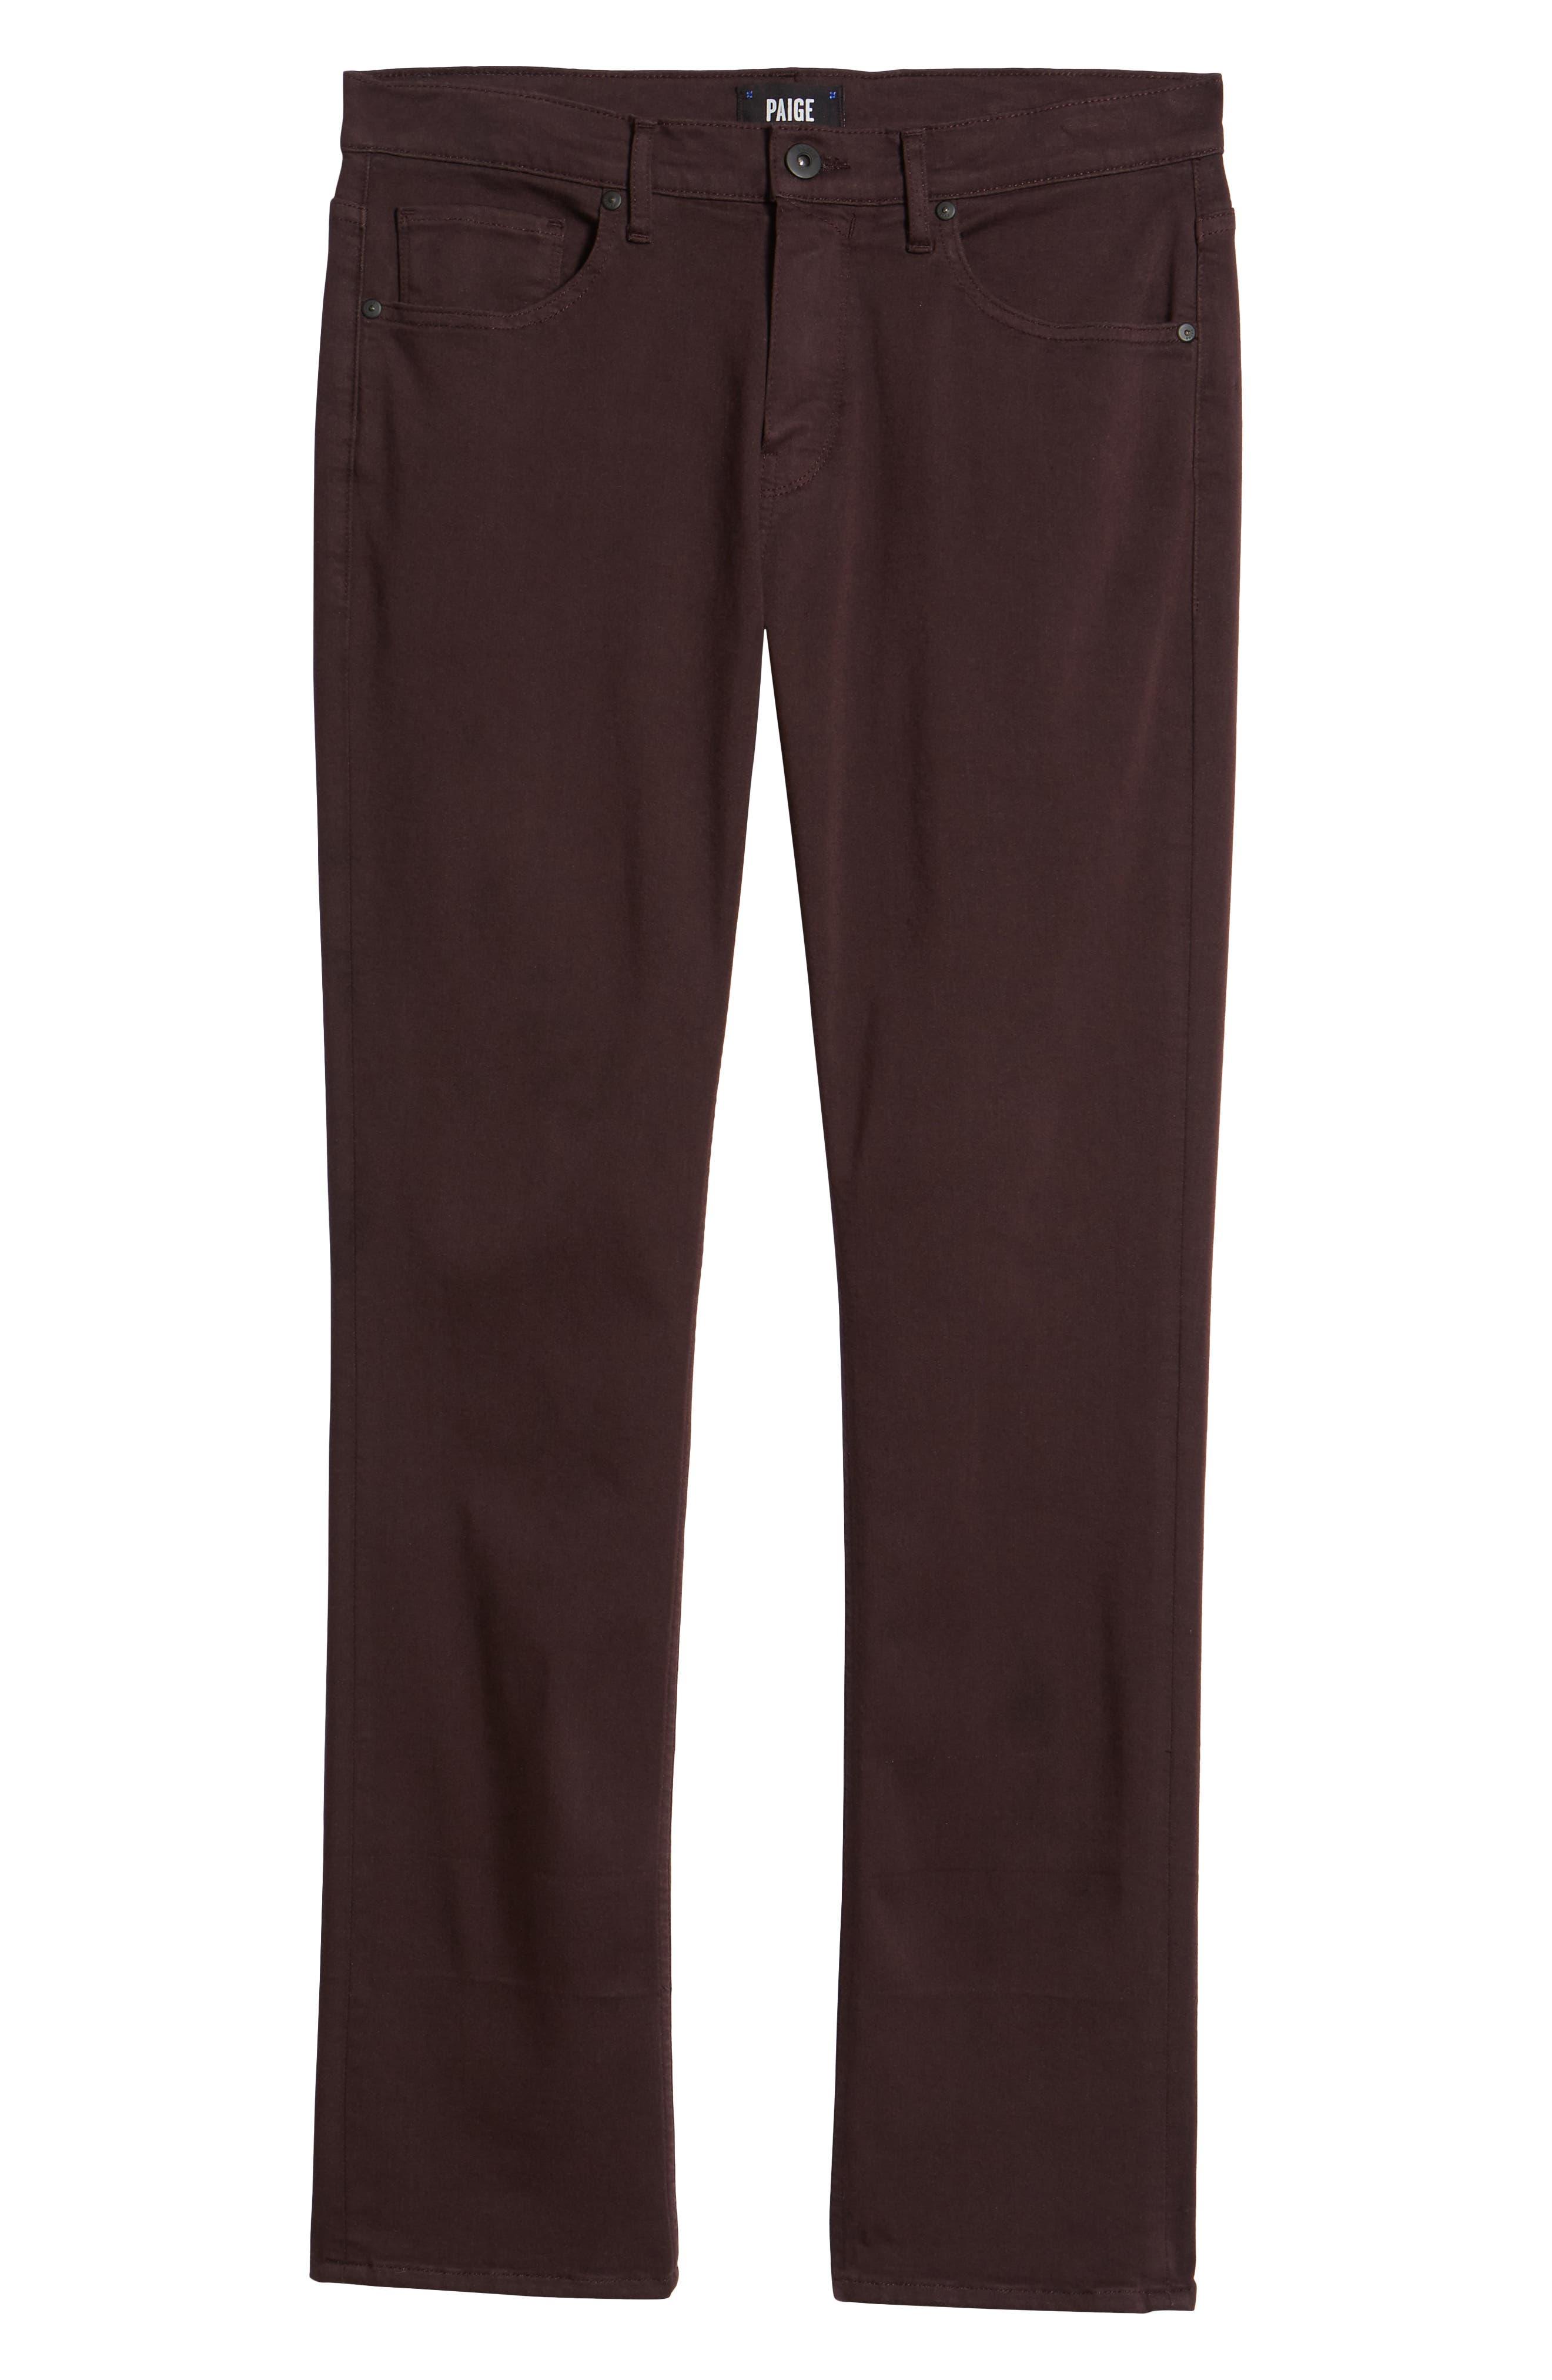 Transcend - Federal Slim Straight Fit Jeans,                             Alternate thumbnail 6, color,                             DARK PORT